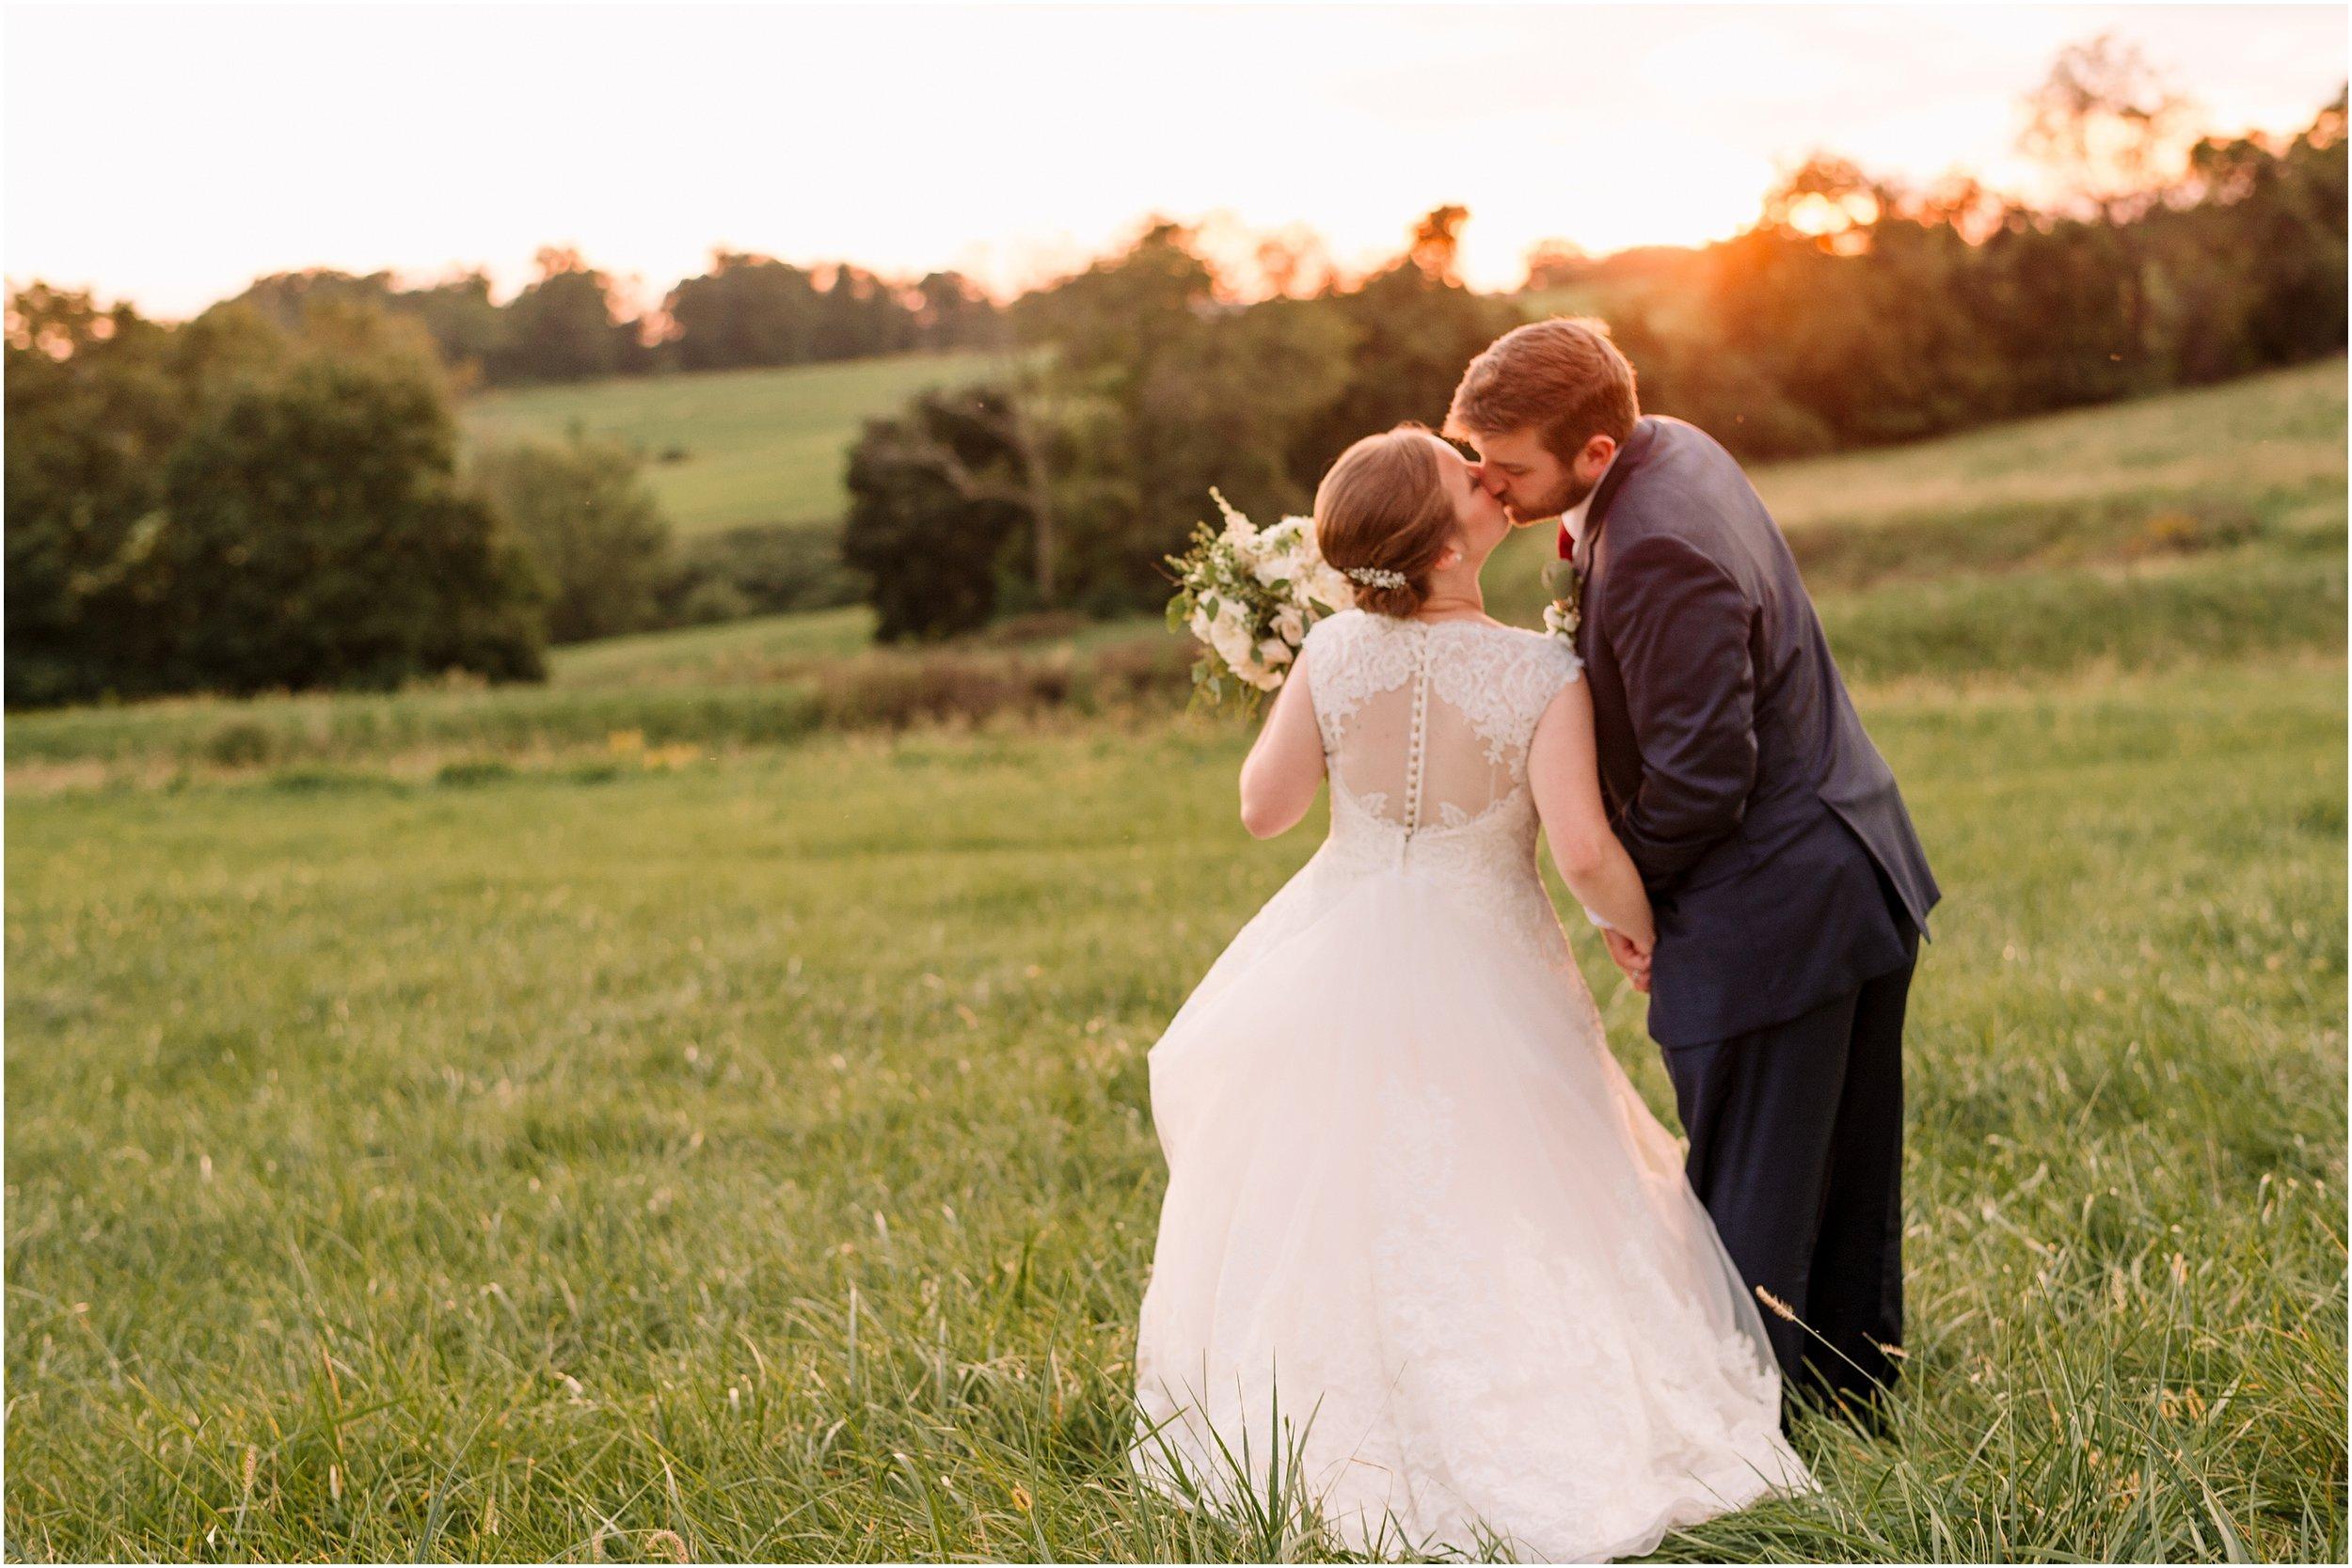 hannah leigh photography Wyndridge Farm Wedding York PA_1558.jpg